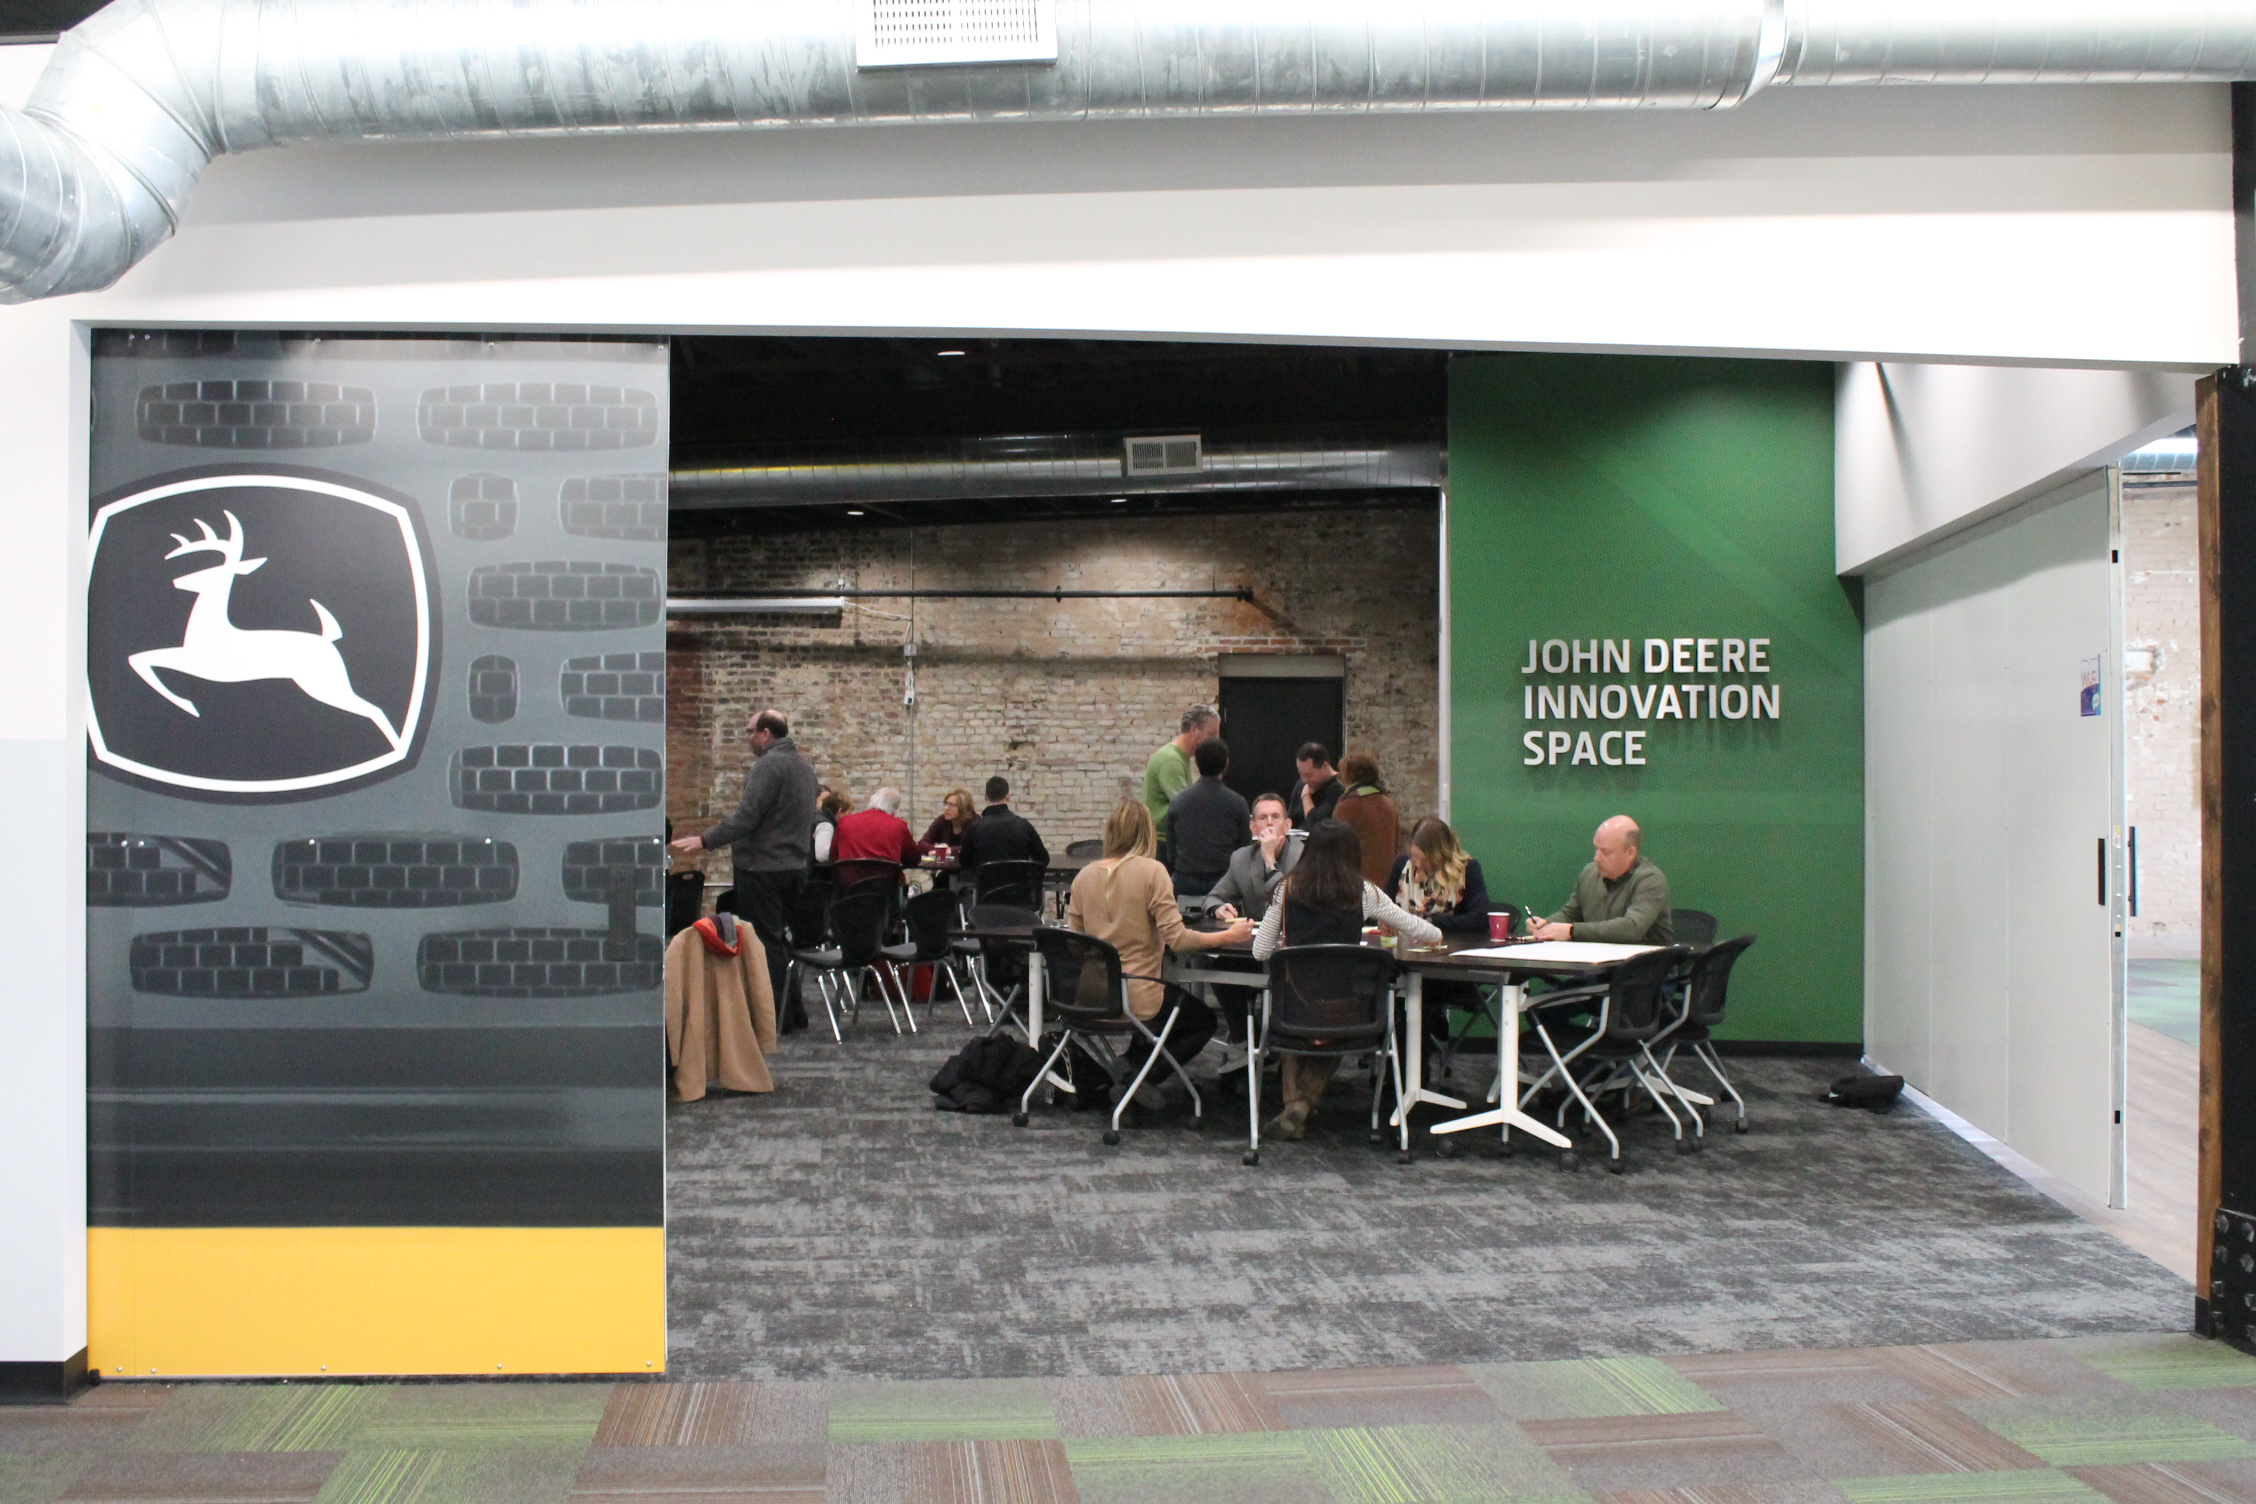 John Deere Innovation Space